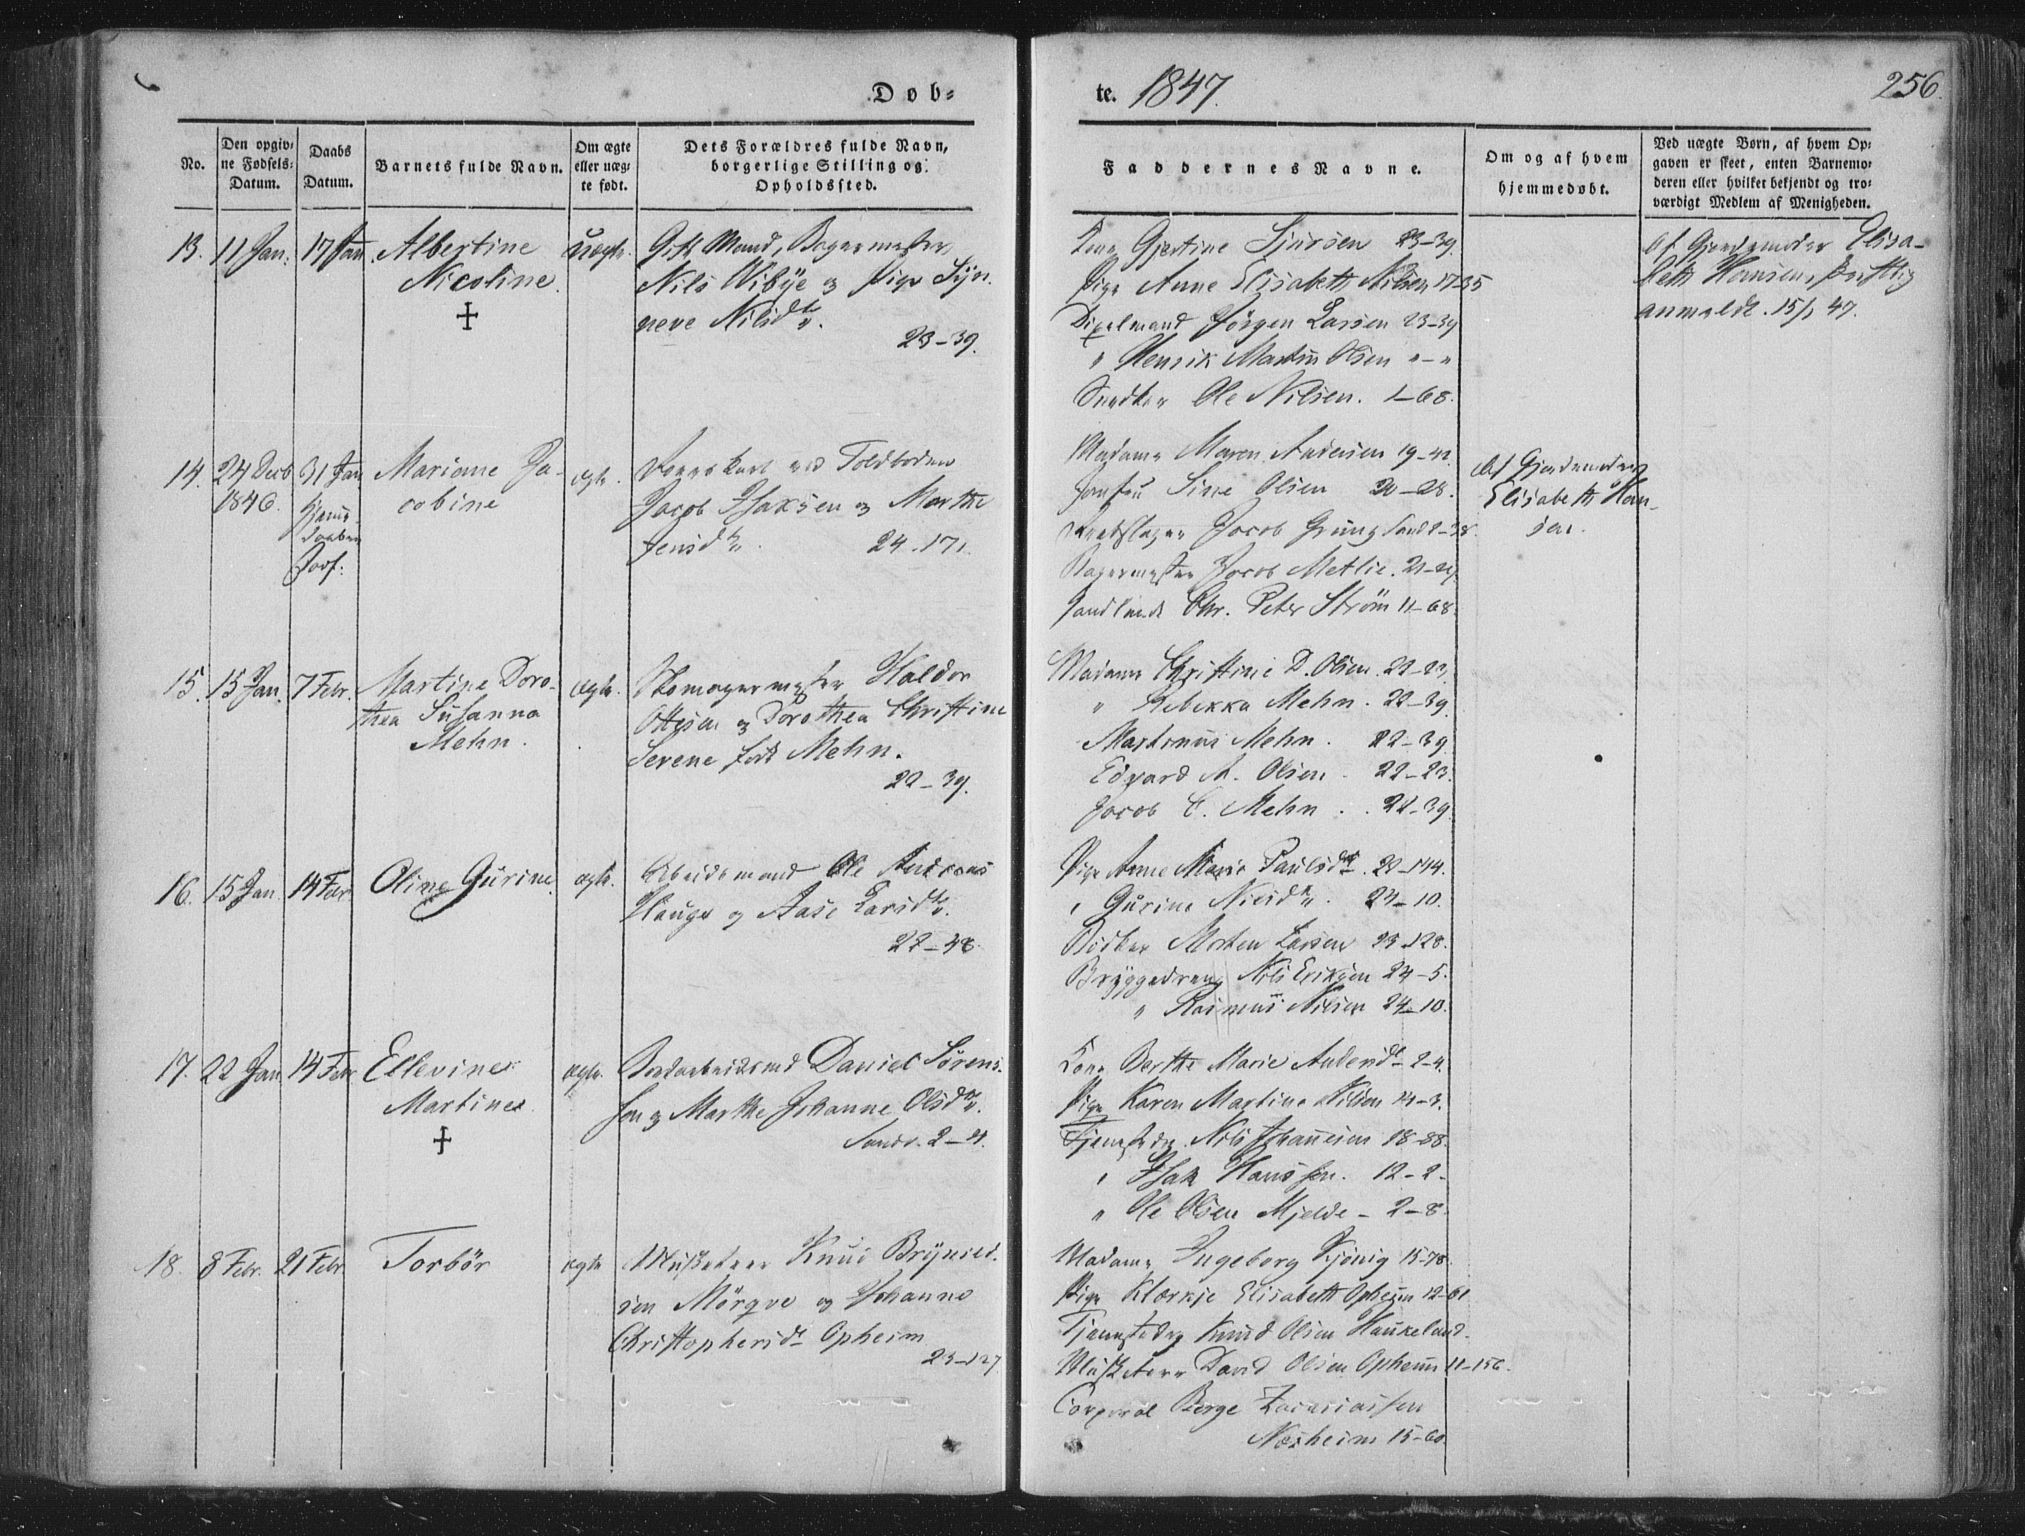 SAB, Korskirken Sokneprestembete, H/Haa/L0016: Ministerialbok nr. B 2, 1841-1851, s. 256